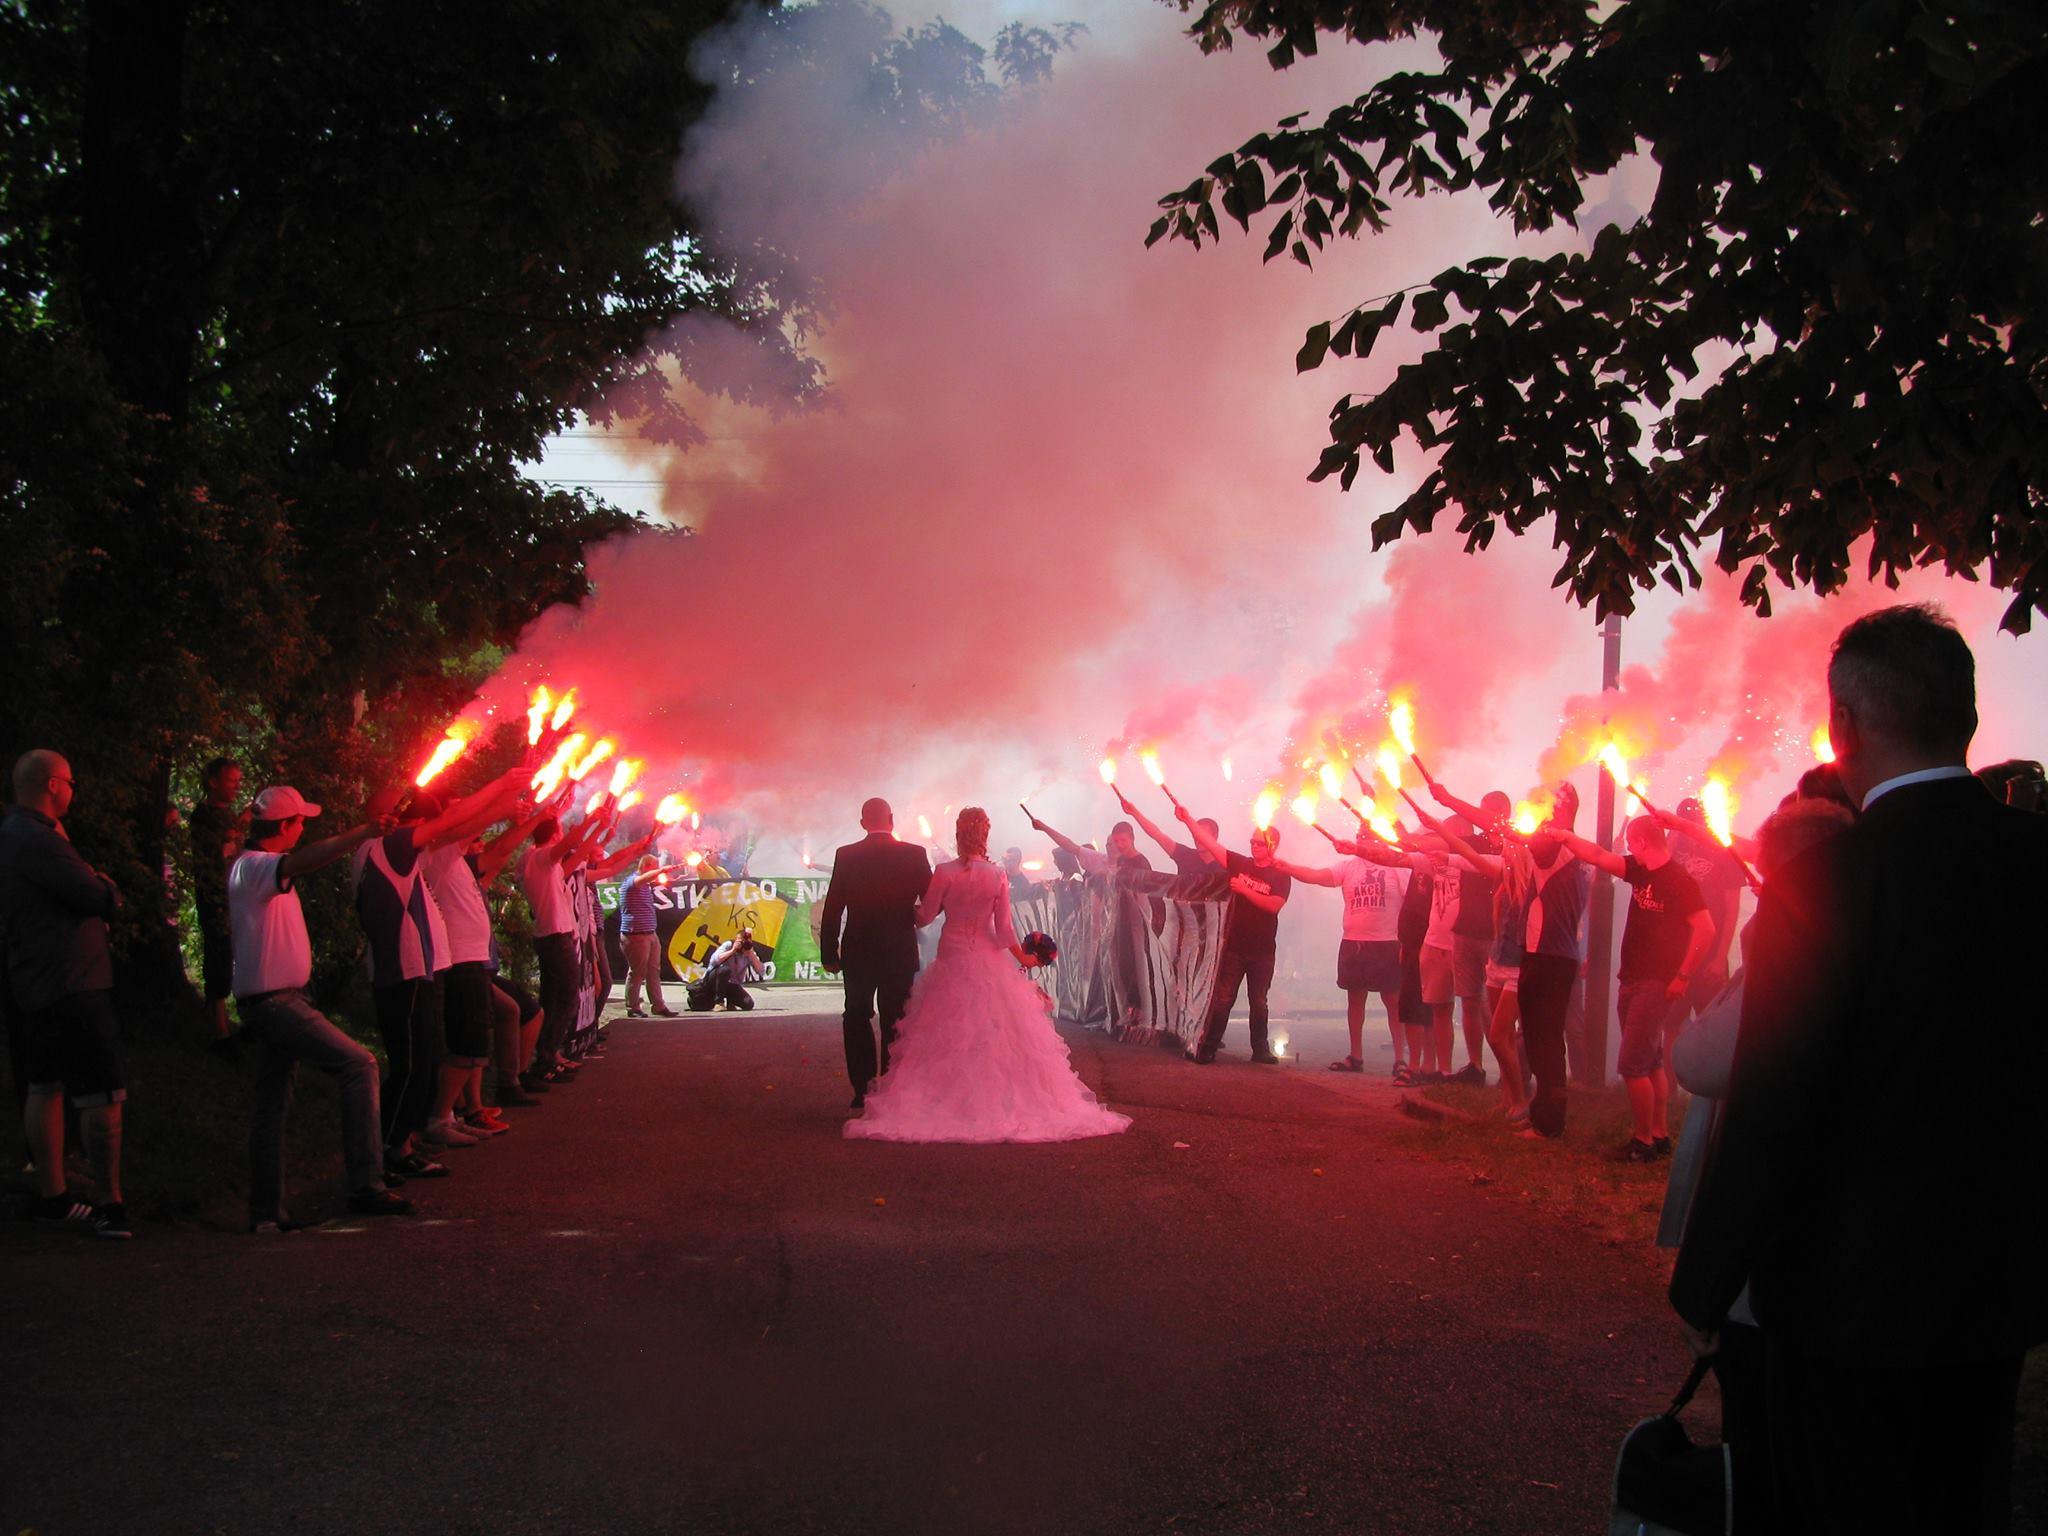 druzebni svatba 2015.jpg (279 KB)